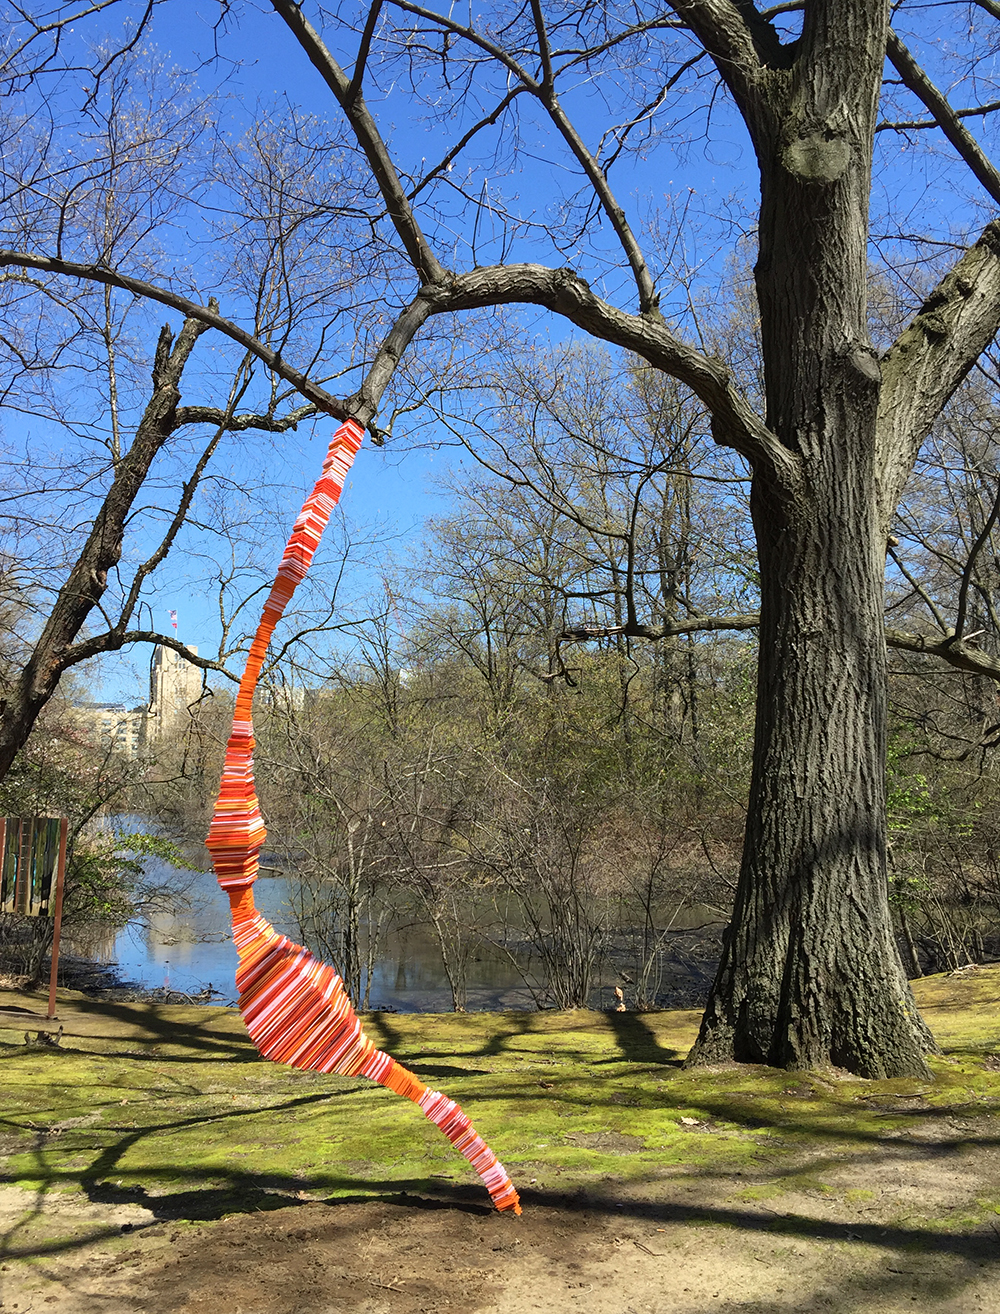 Tree to Ground, 2016. Freedom Baird. Coroplast, PVC, styrofoam, steel. Riverway Park, Boston, MA. Gateways exhibition, Studios Without Walls